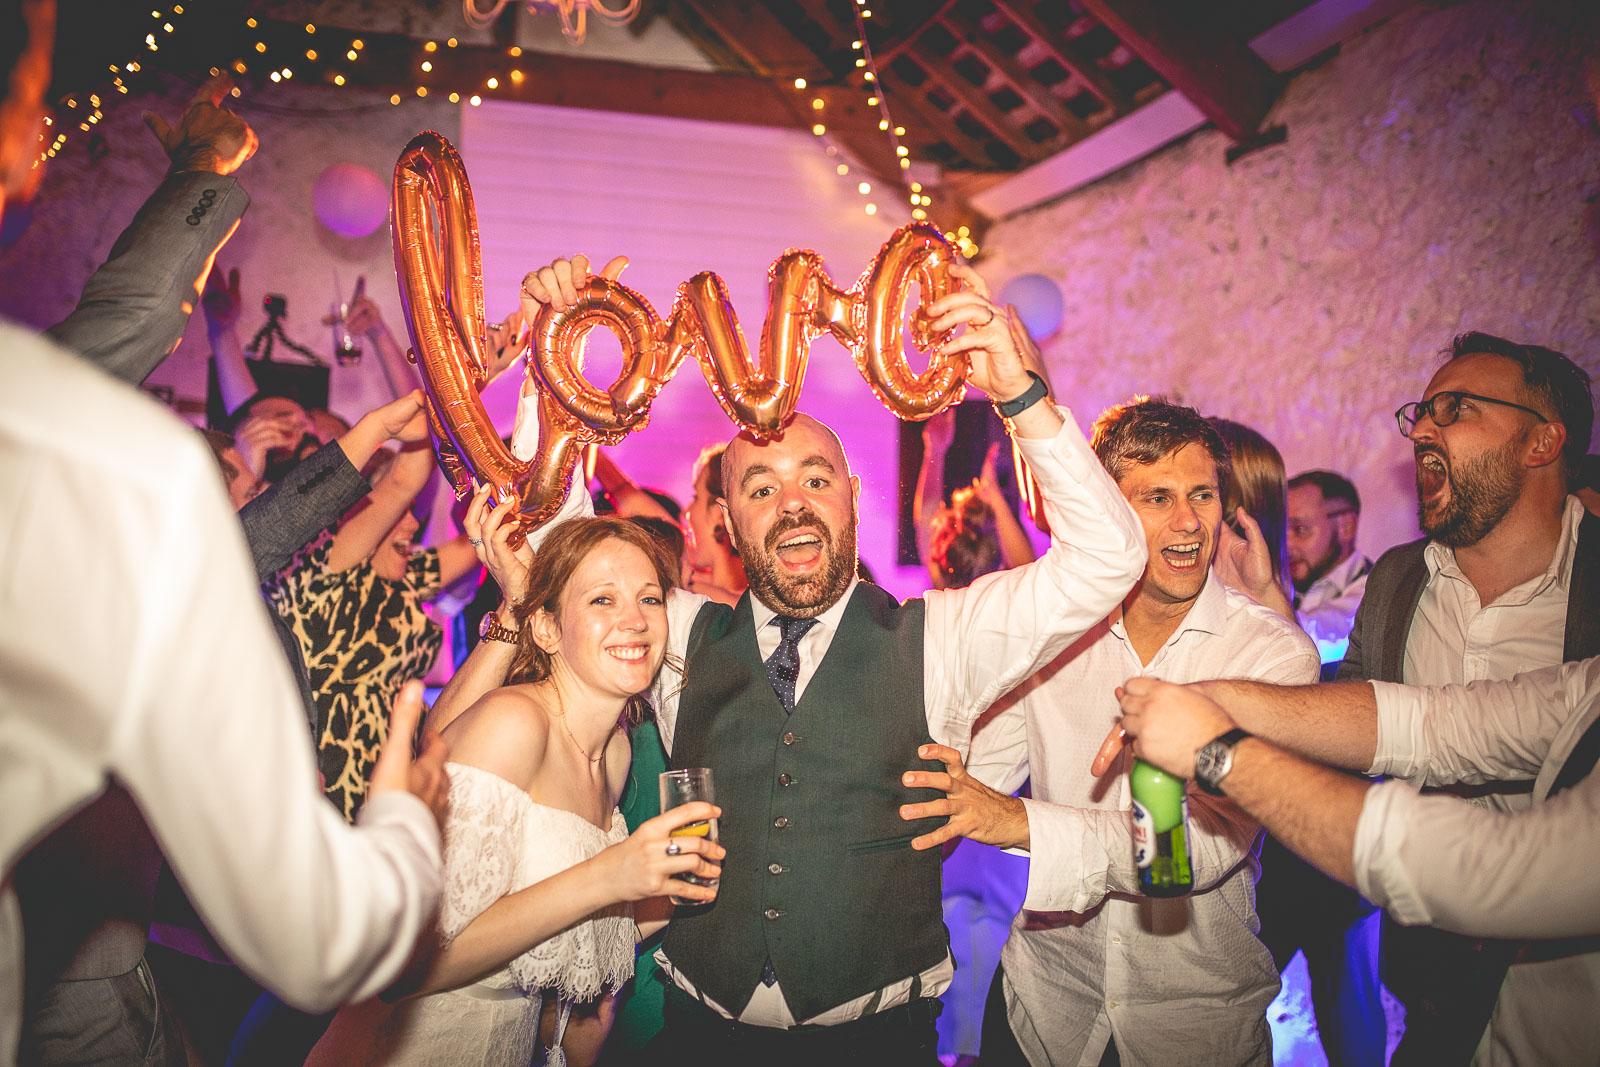 the old barn - clovelly - ugotthelove - wedding photography-9580.jpg